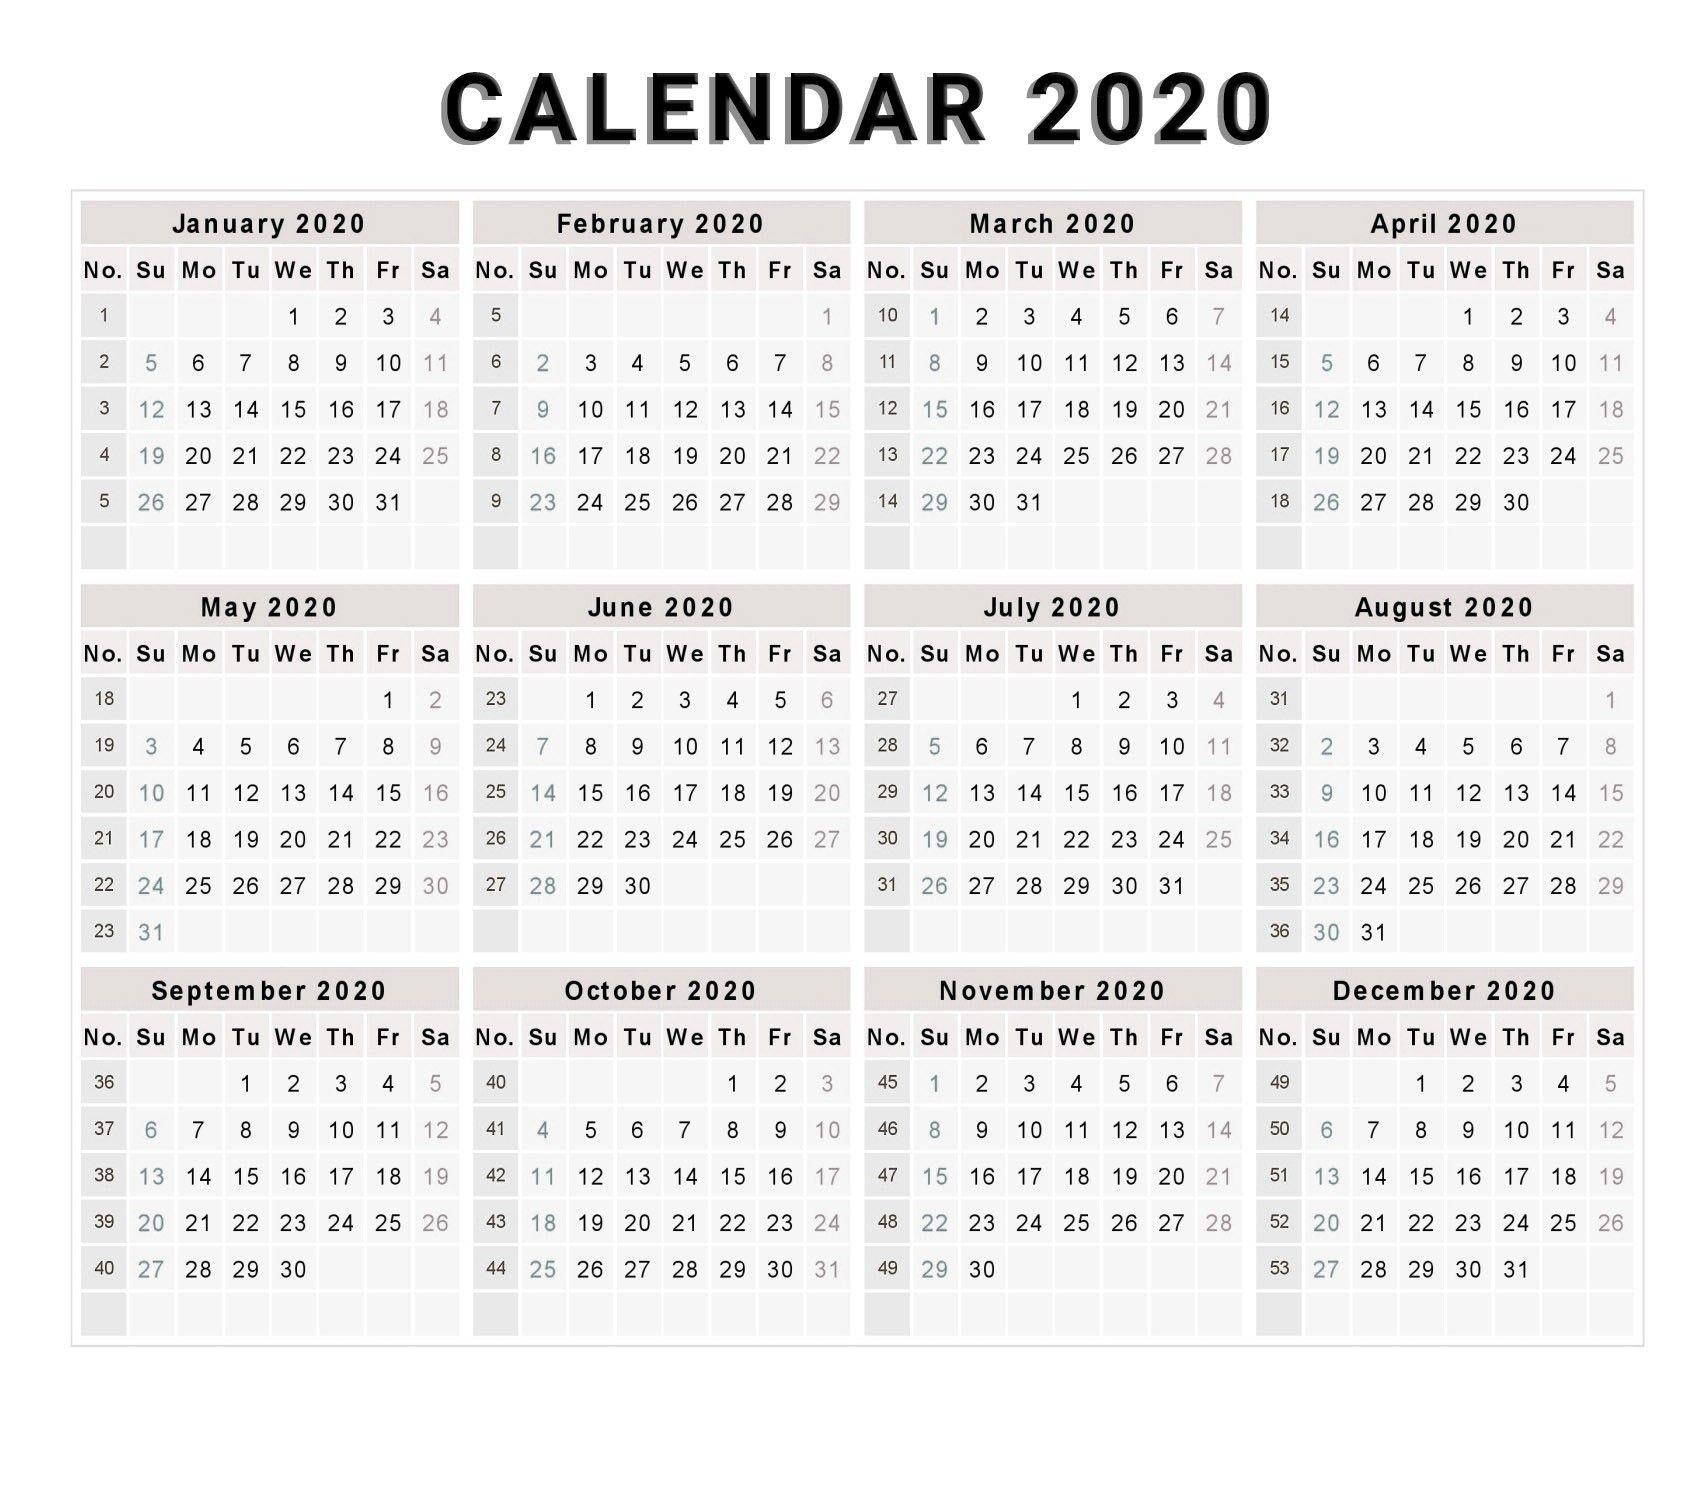 Calendar 2020 Free Printable Calendar 2020 Free 2020 regarding Free Year At A Glance Calendar 2020 Printable